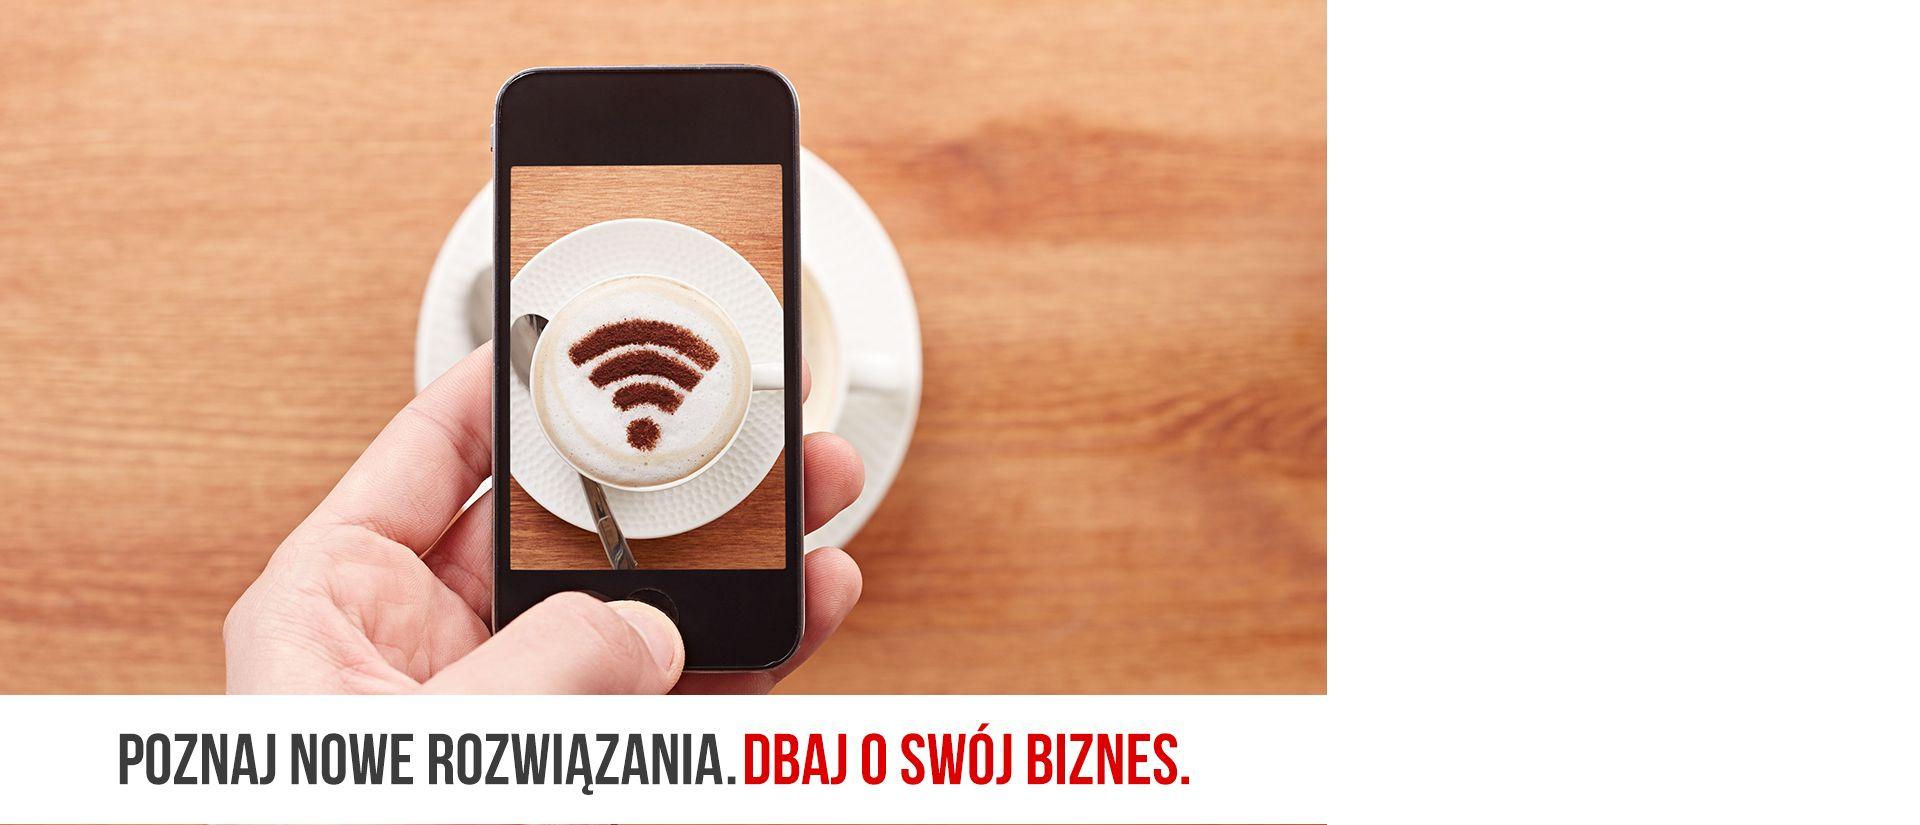 dbaj_o_swoj_biznes_v2